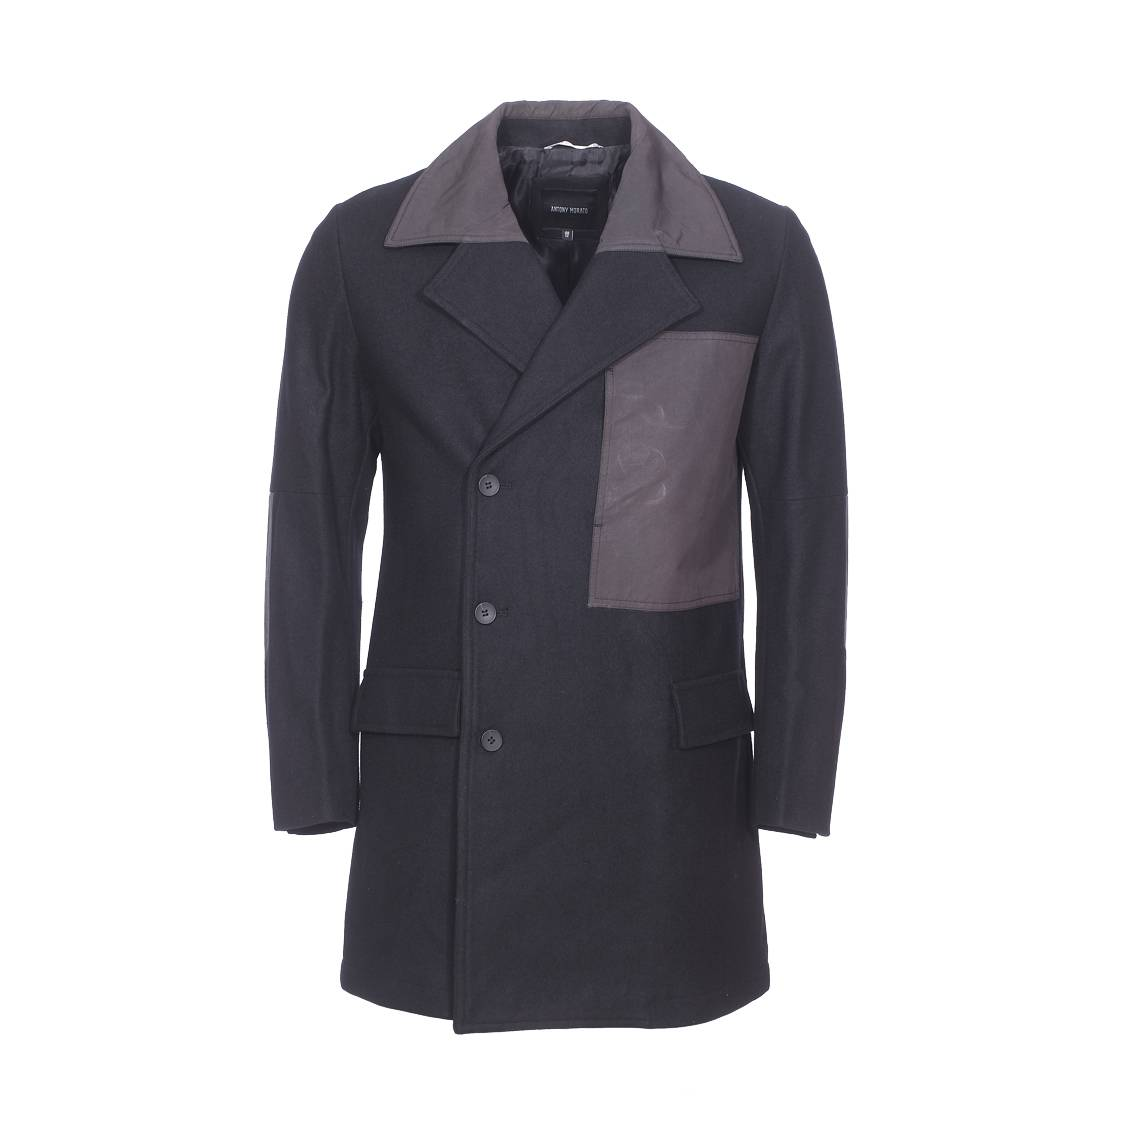 Antony morato - manteau, caban, duffle coat